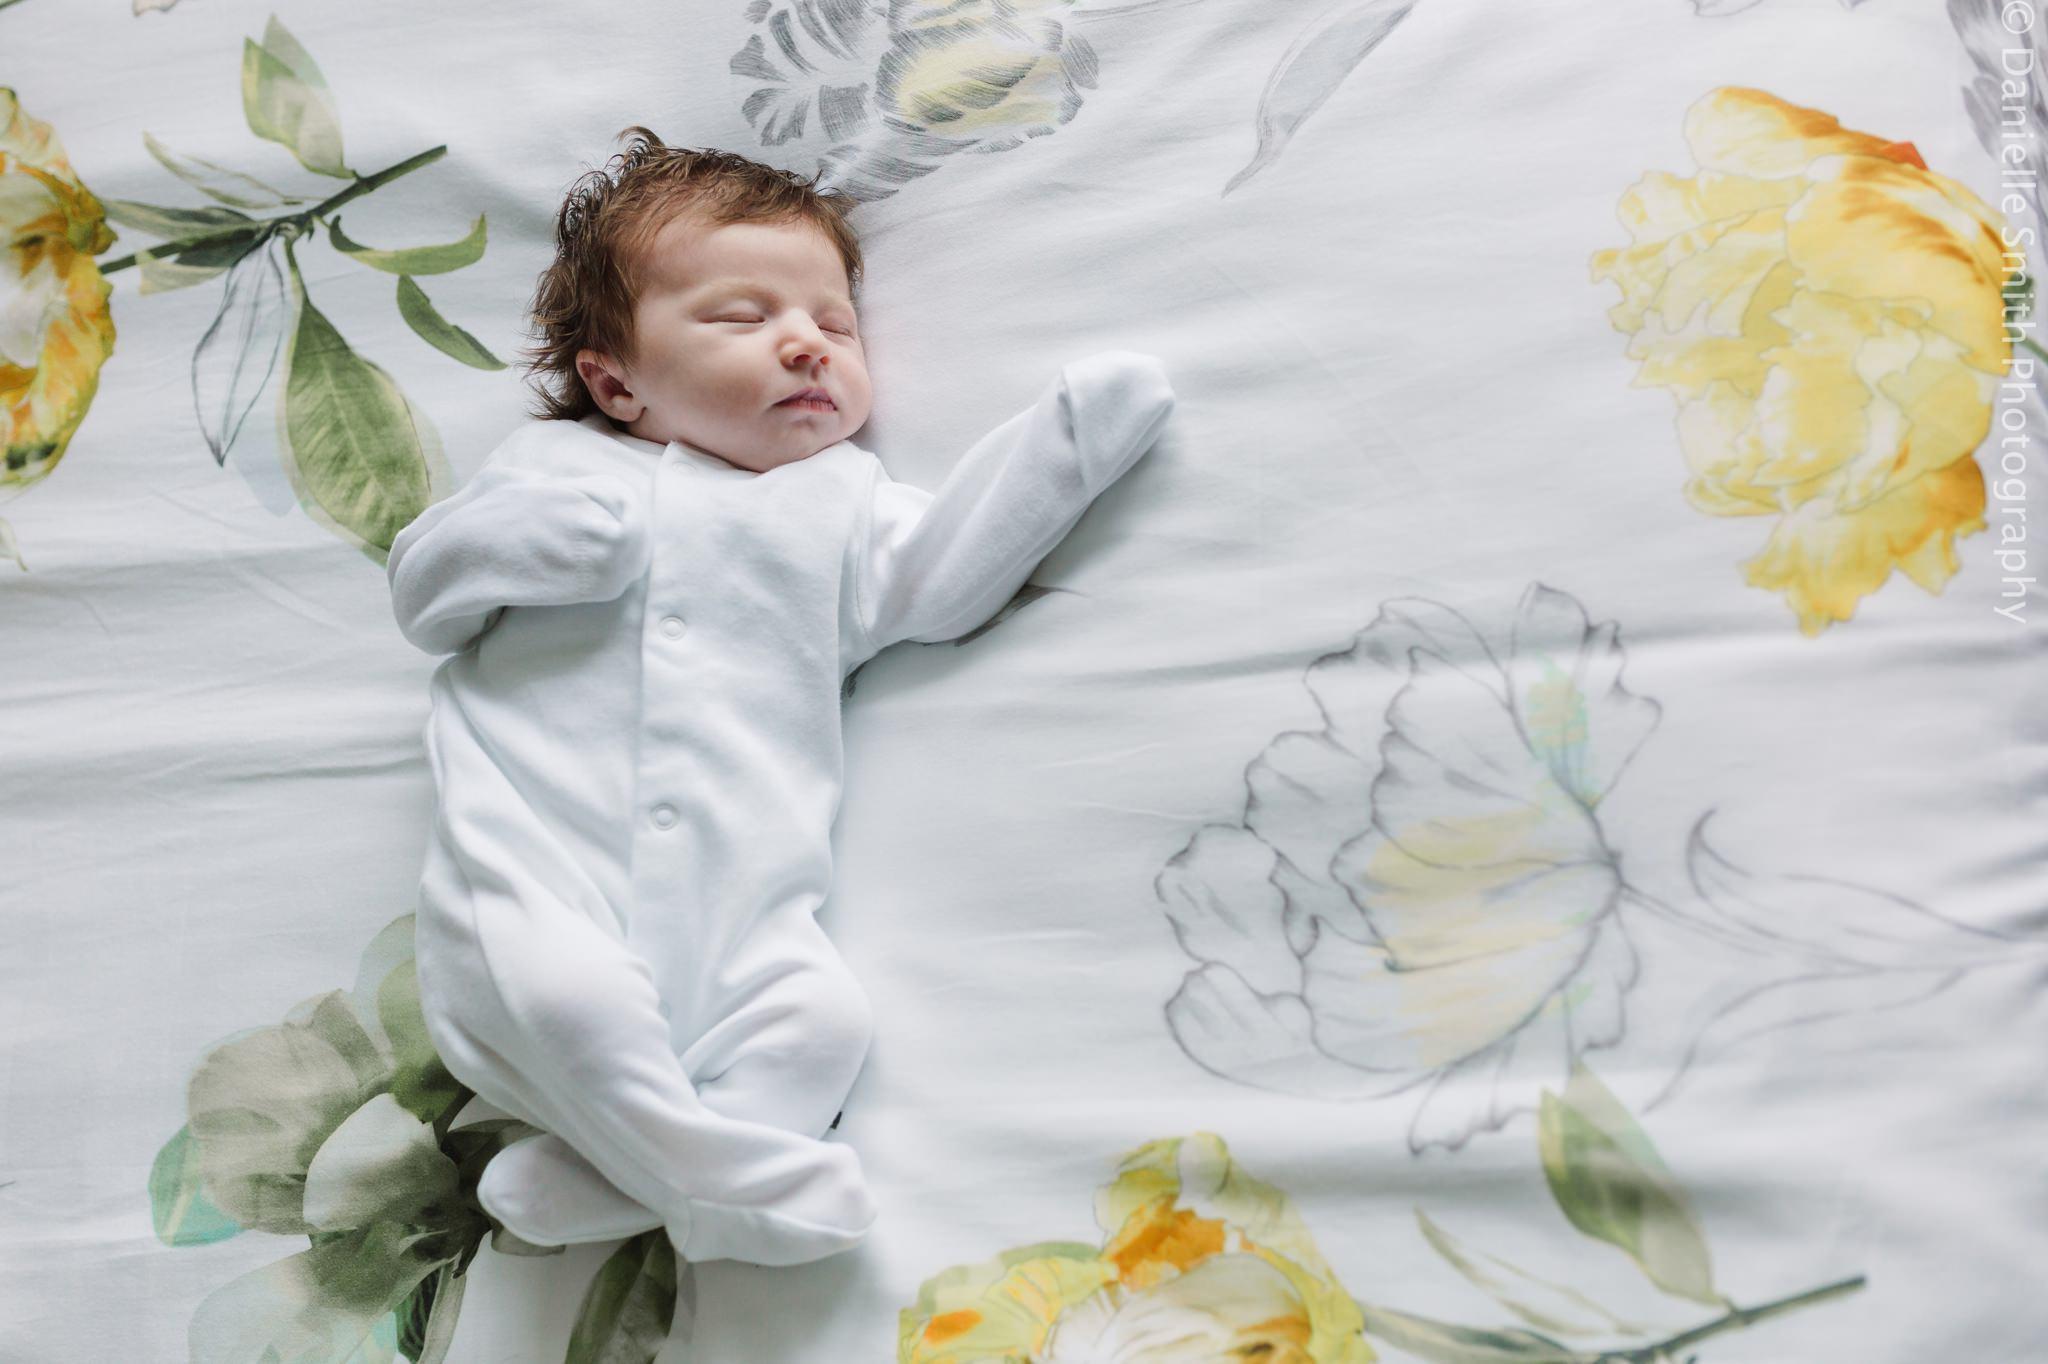 newborn baby in baby grow on bed